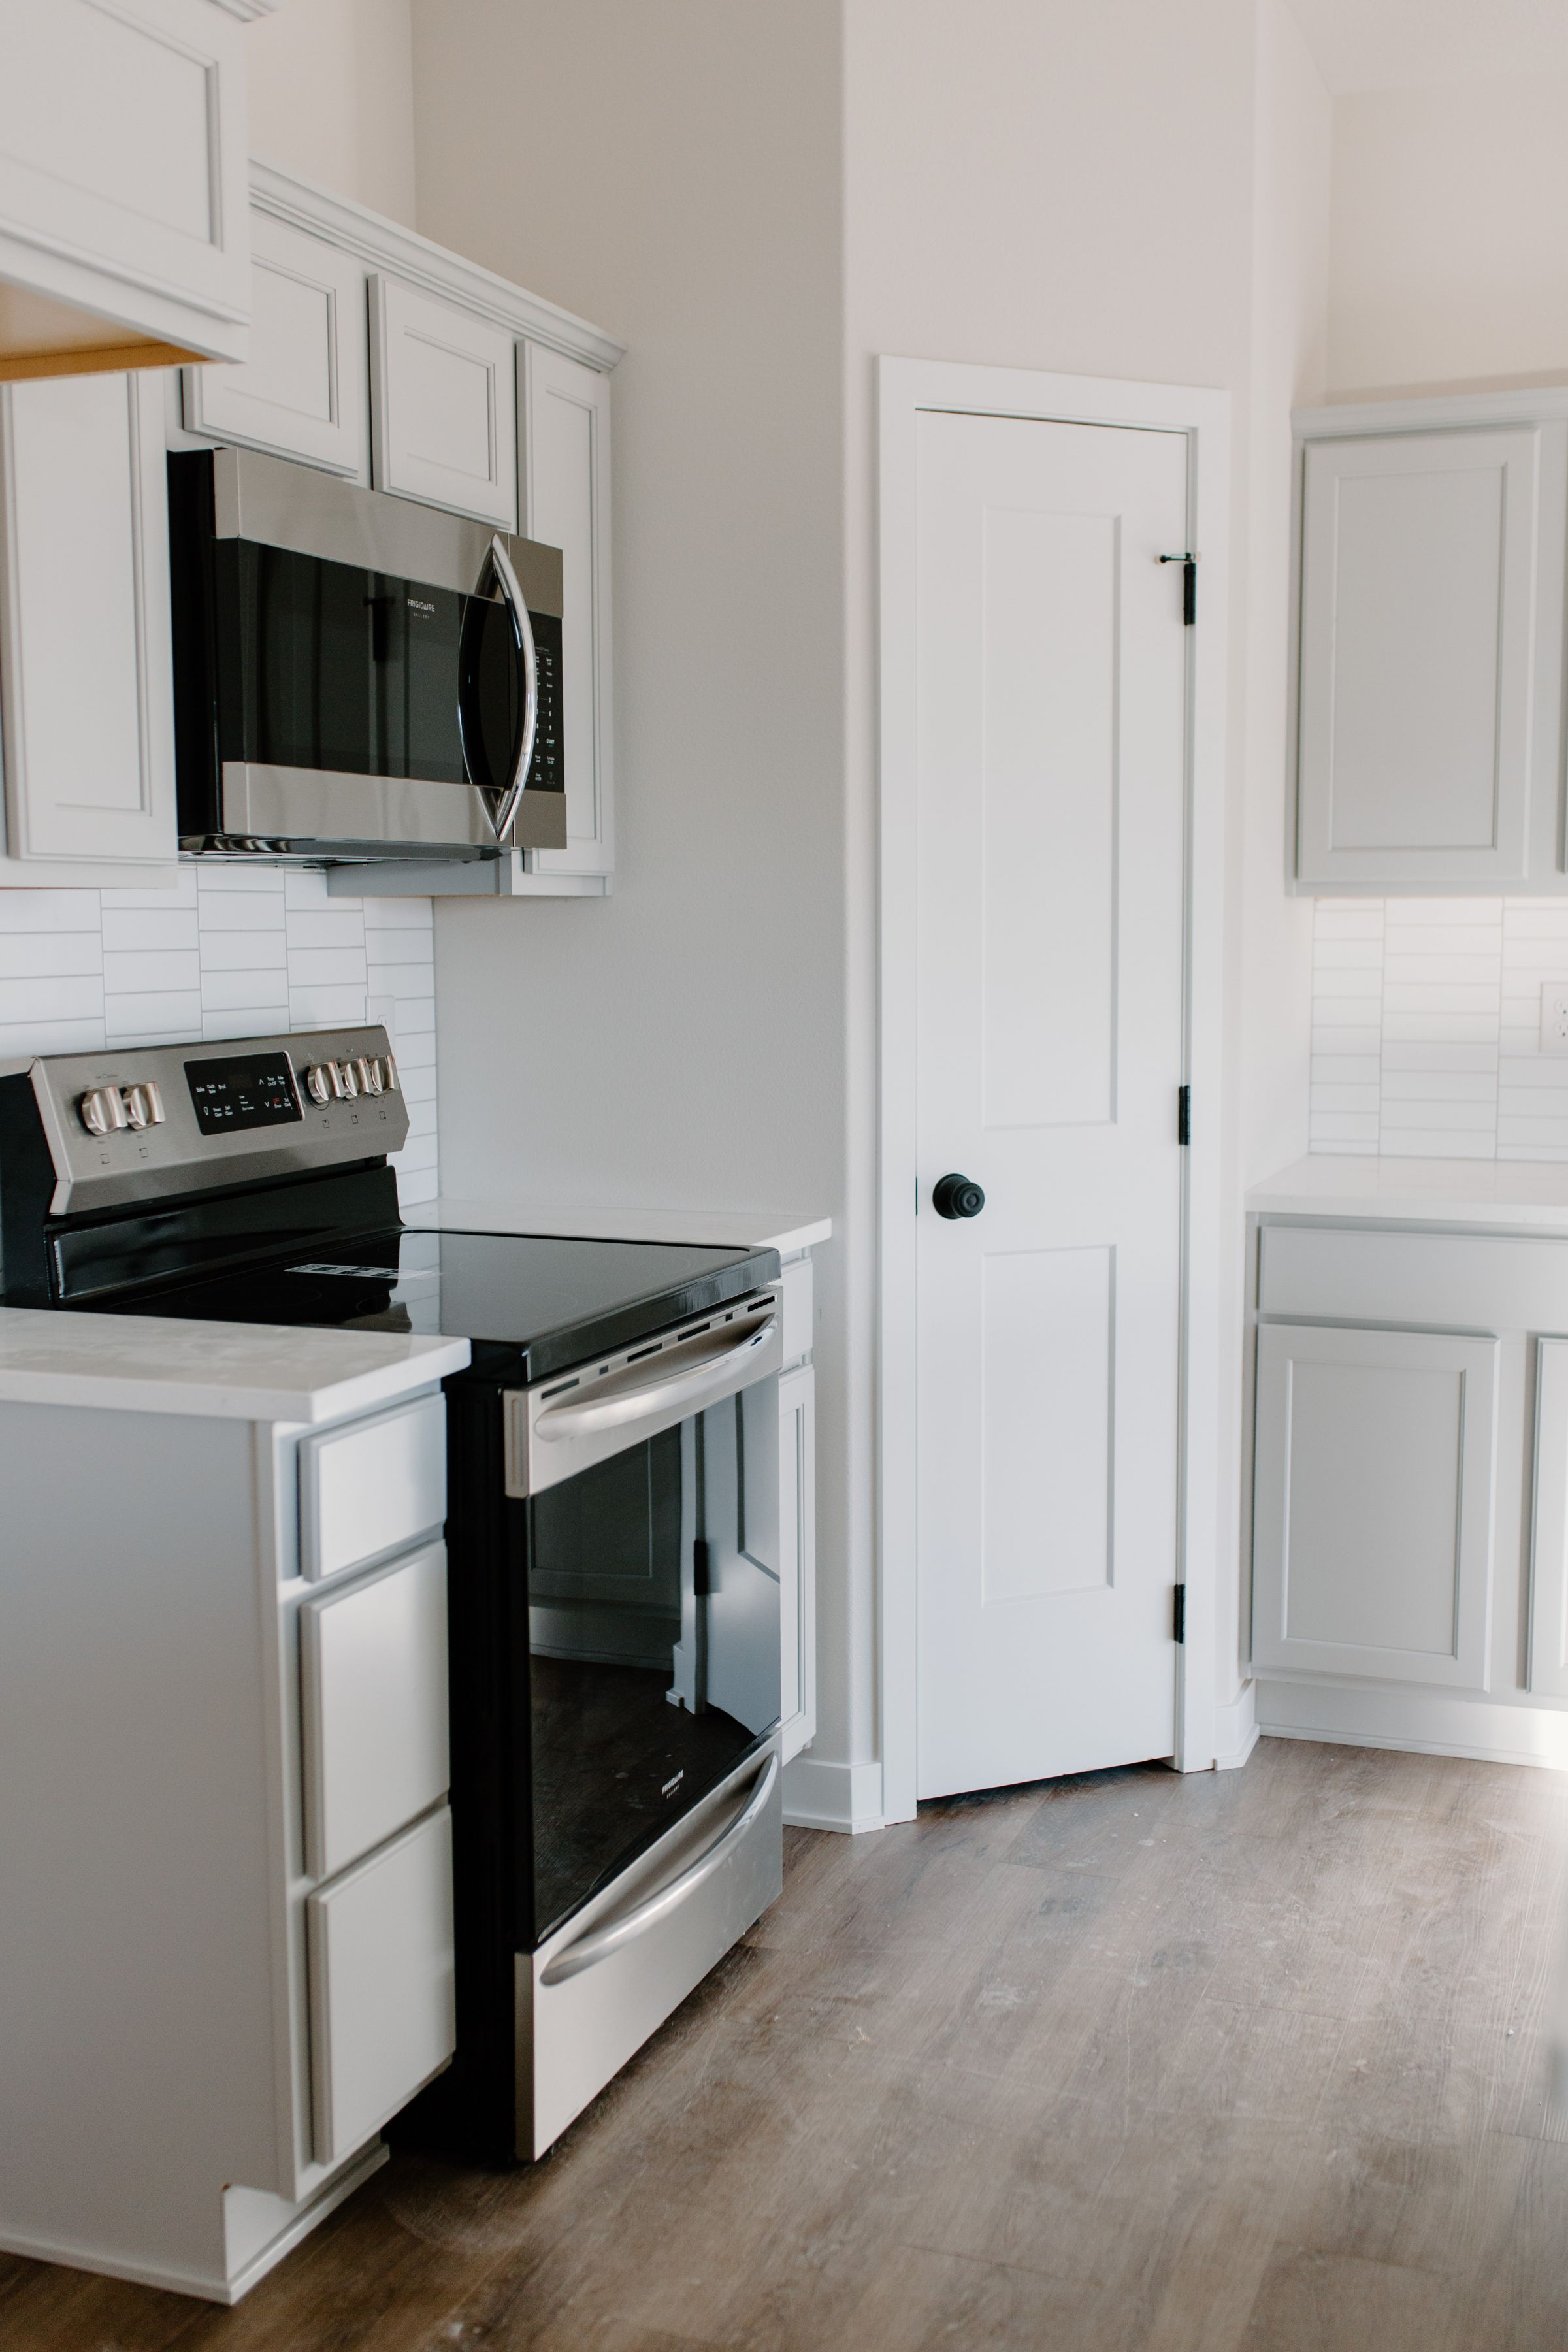 residential-warren-county-iowa-0-acres-listing-number-15365-4-2021-02-17-220737.jpg